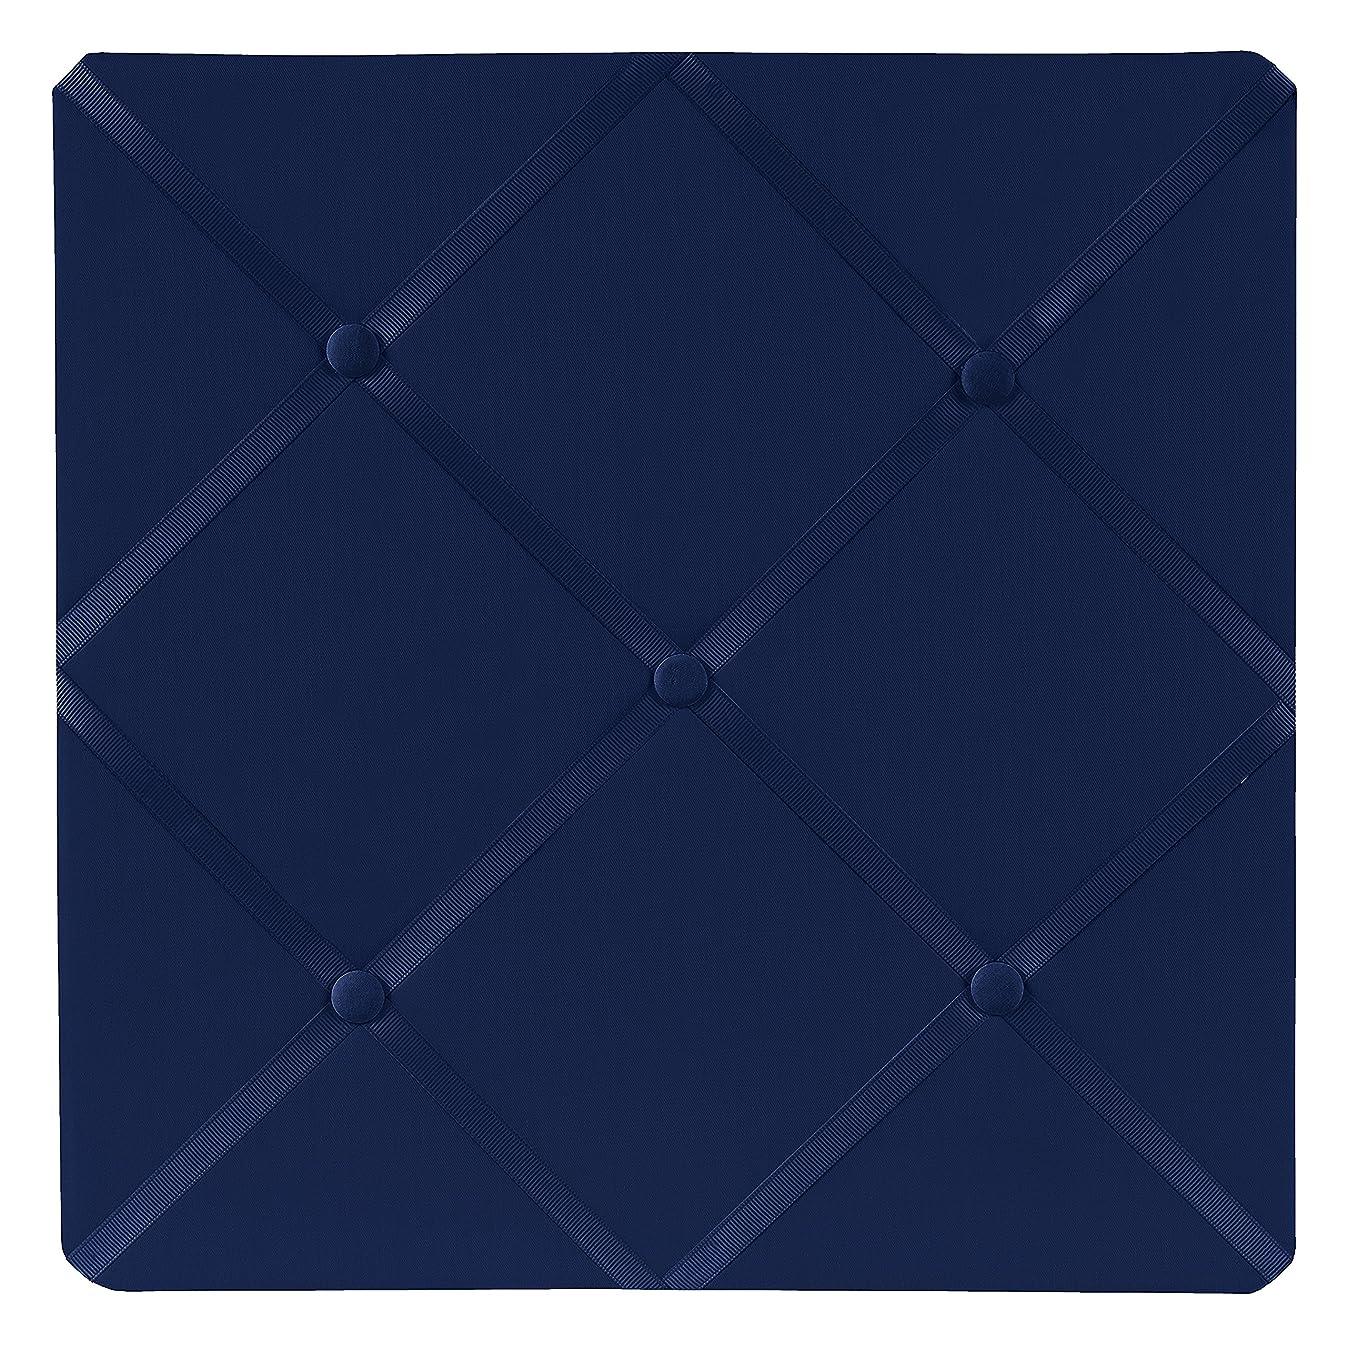 Sweet Jojo Designs Navy Blue Fabric Memory/Memo Photo Bulletin Board